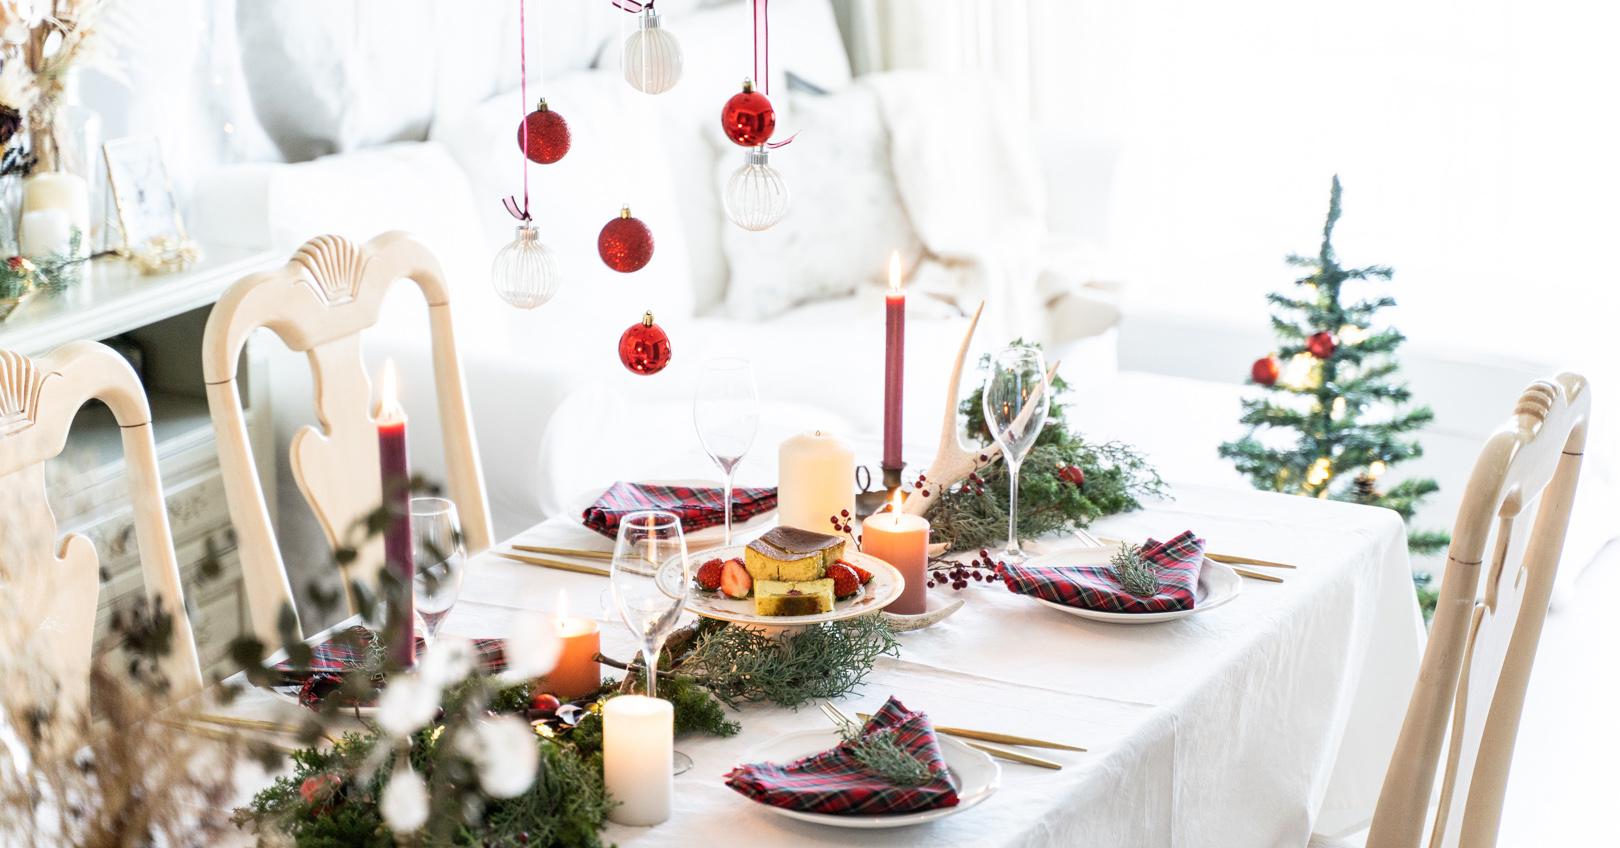 TARTAN CHRISTMAS WITH REINDEER